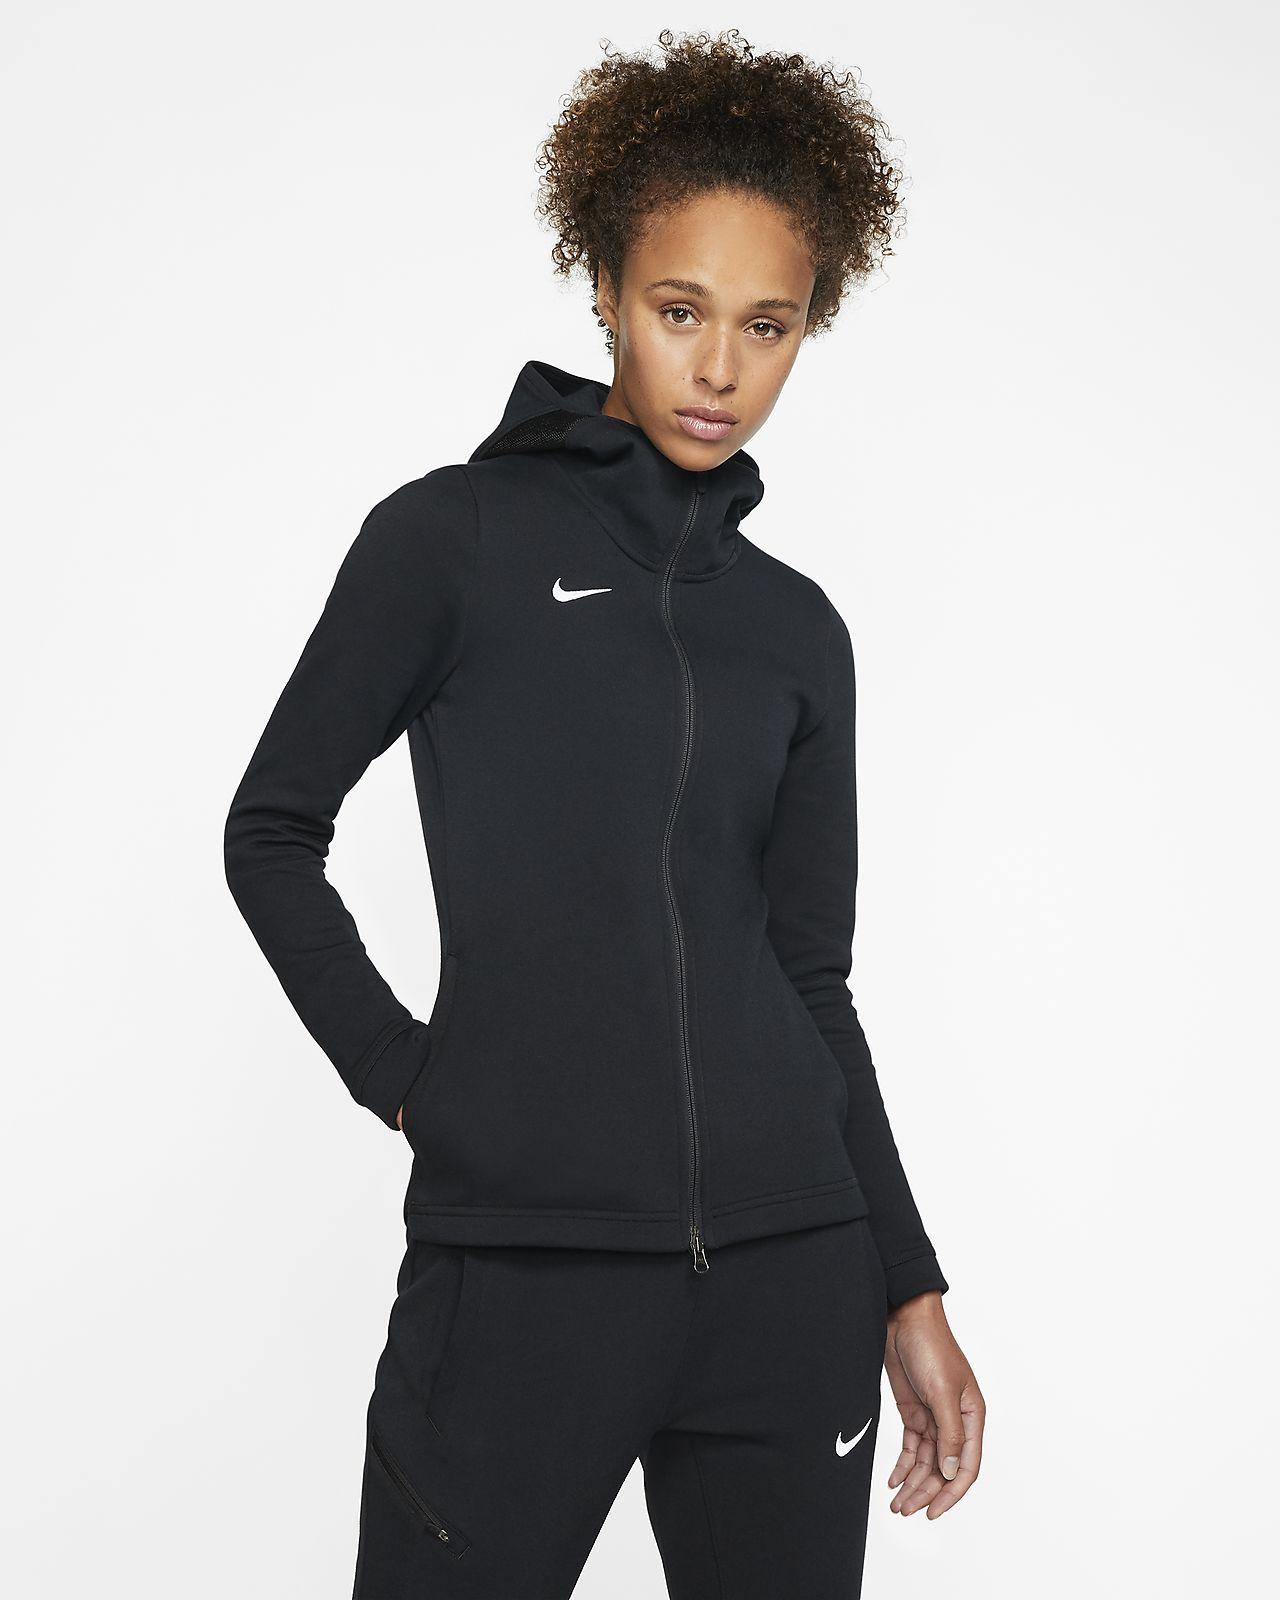 nike dri fit hoodie women's